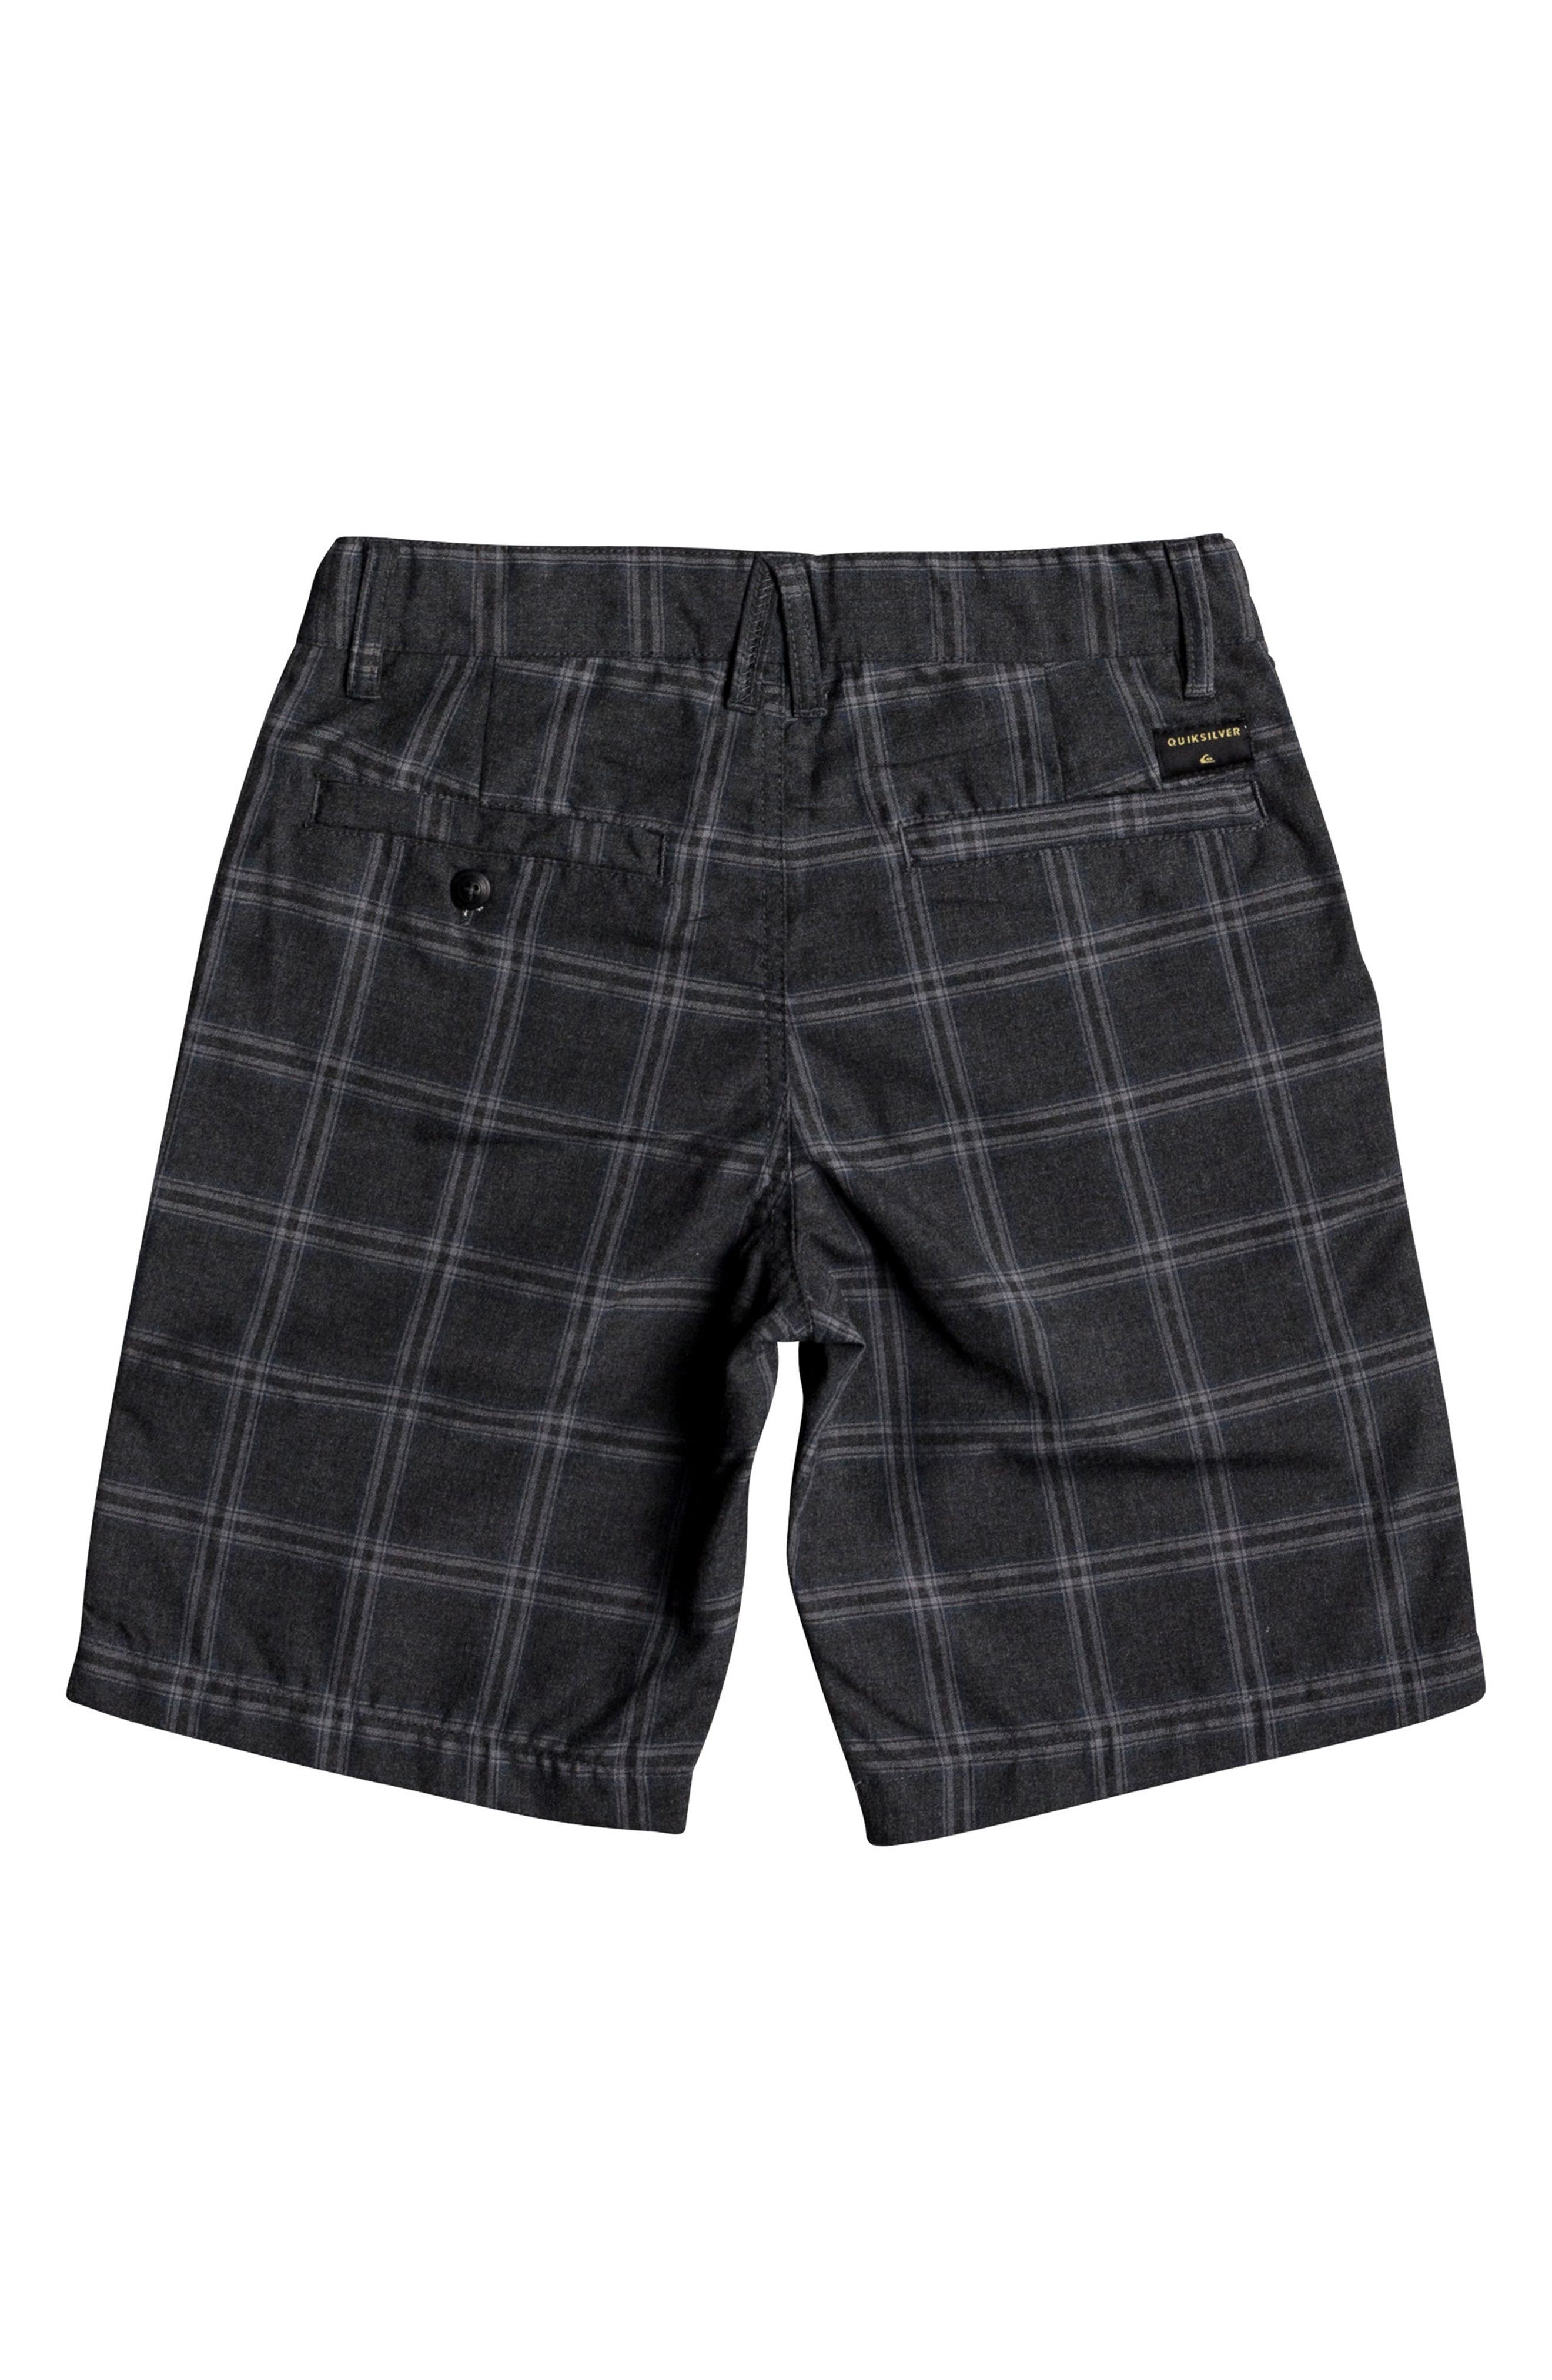 Alternate Image 2  - Quiksilver Regeneration Shorts (Big Boys)